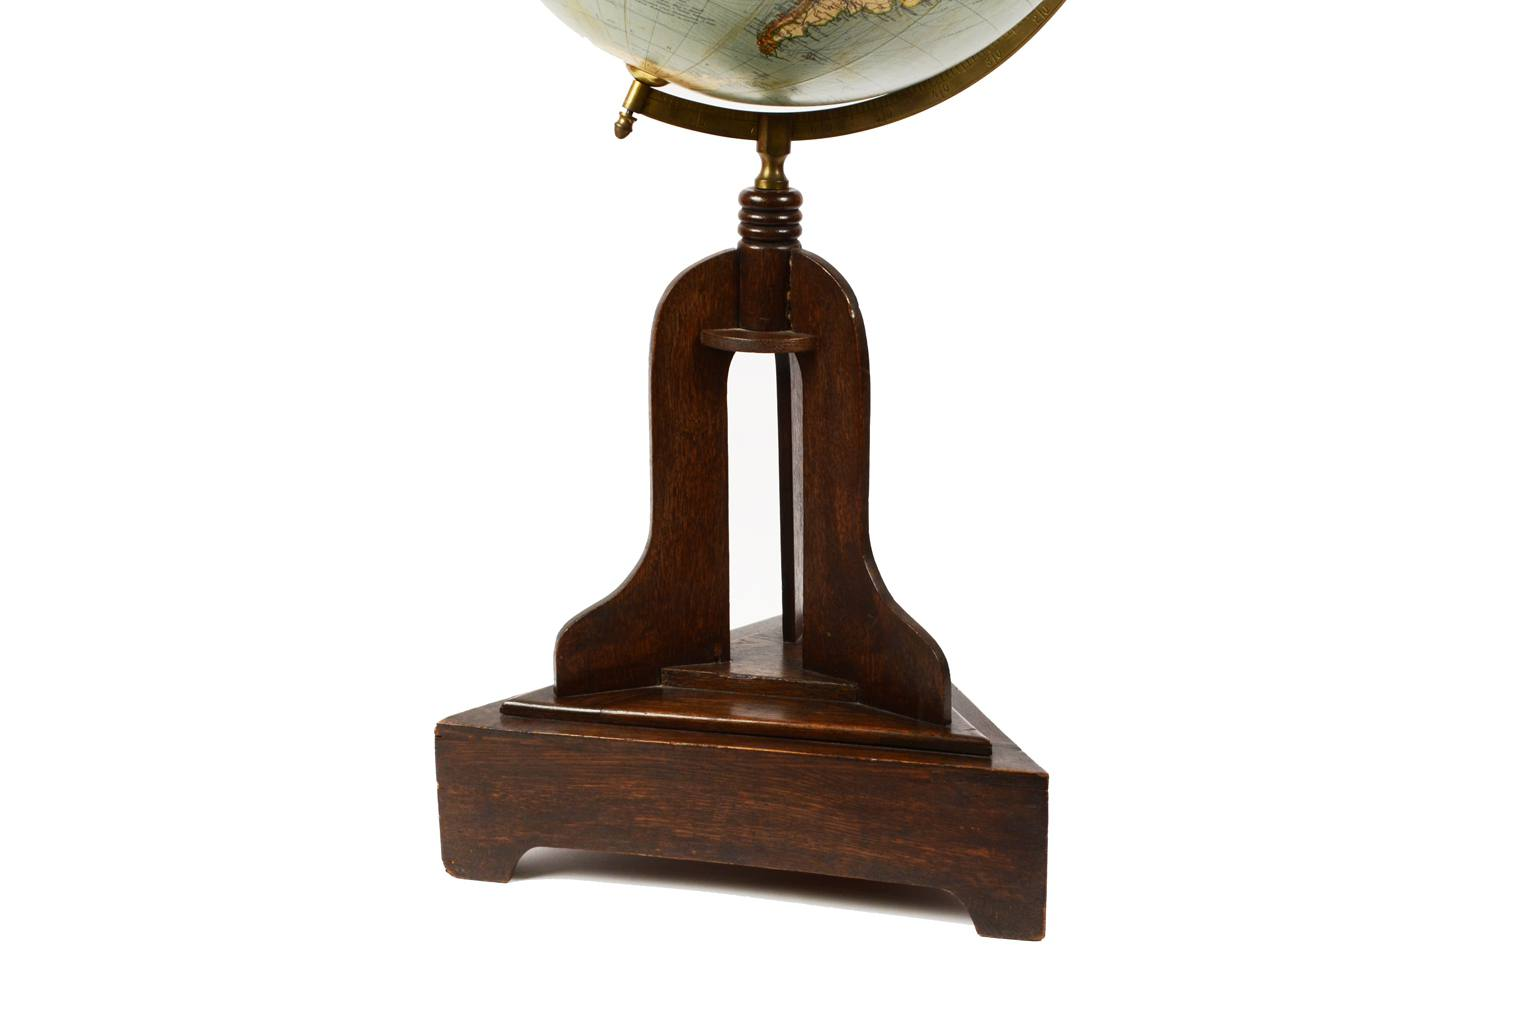 Globi-mappamondi antichi/1795-Globo Columbus 1920